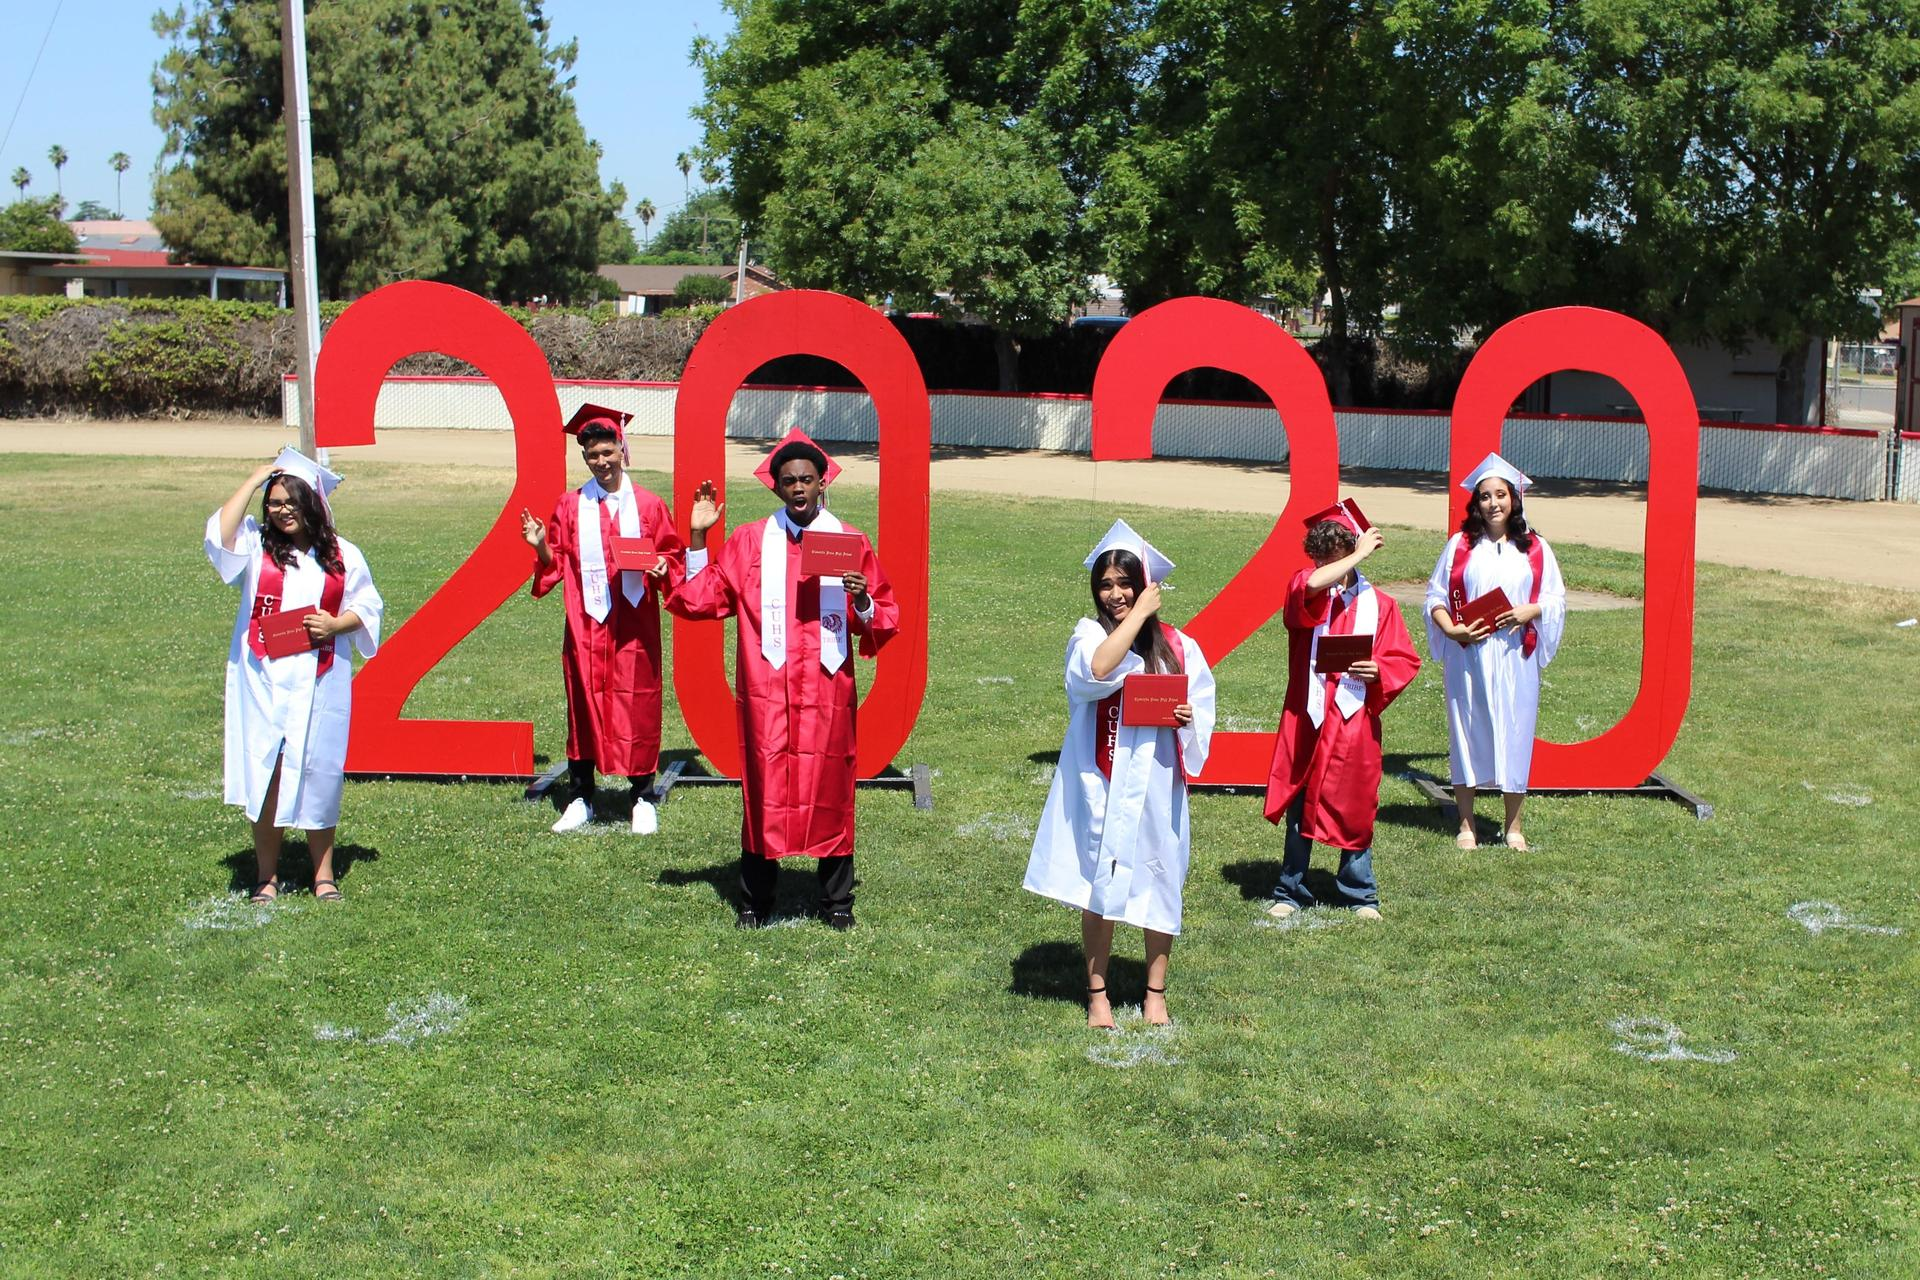 Left to right, Yacqueline Zapata, Andres Martinez Mares, DaJon Davison, Mara Avila, Kyle MacDonald, and Alize Velasco turning their tassels